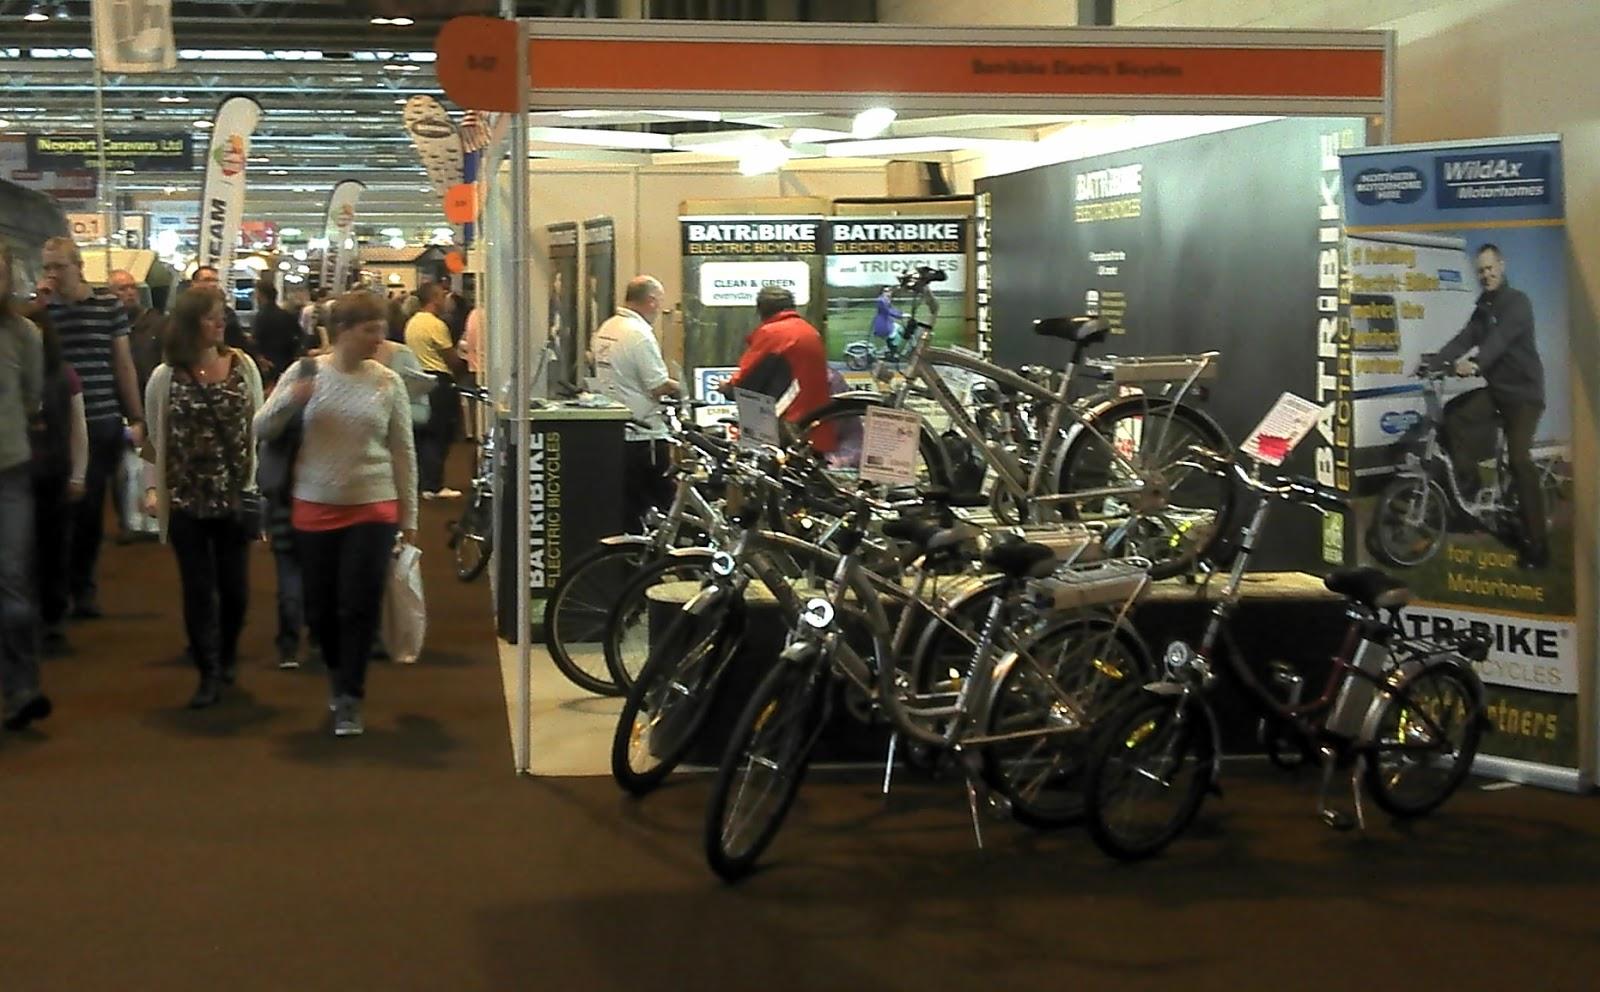 Batribike electric bicycles: October 2012